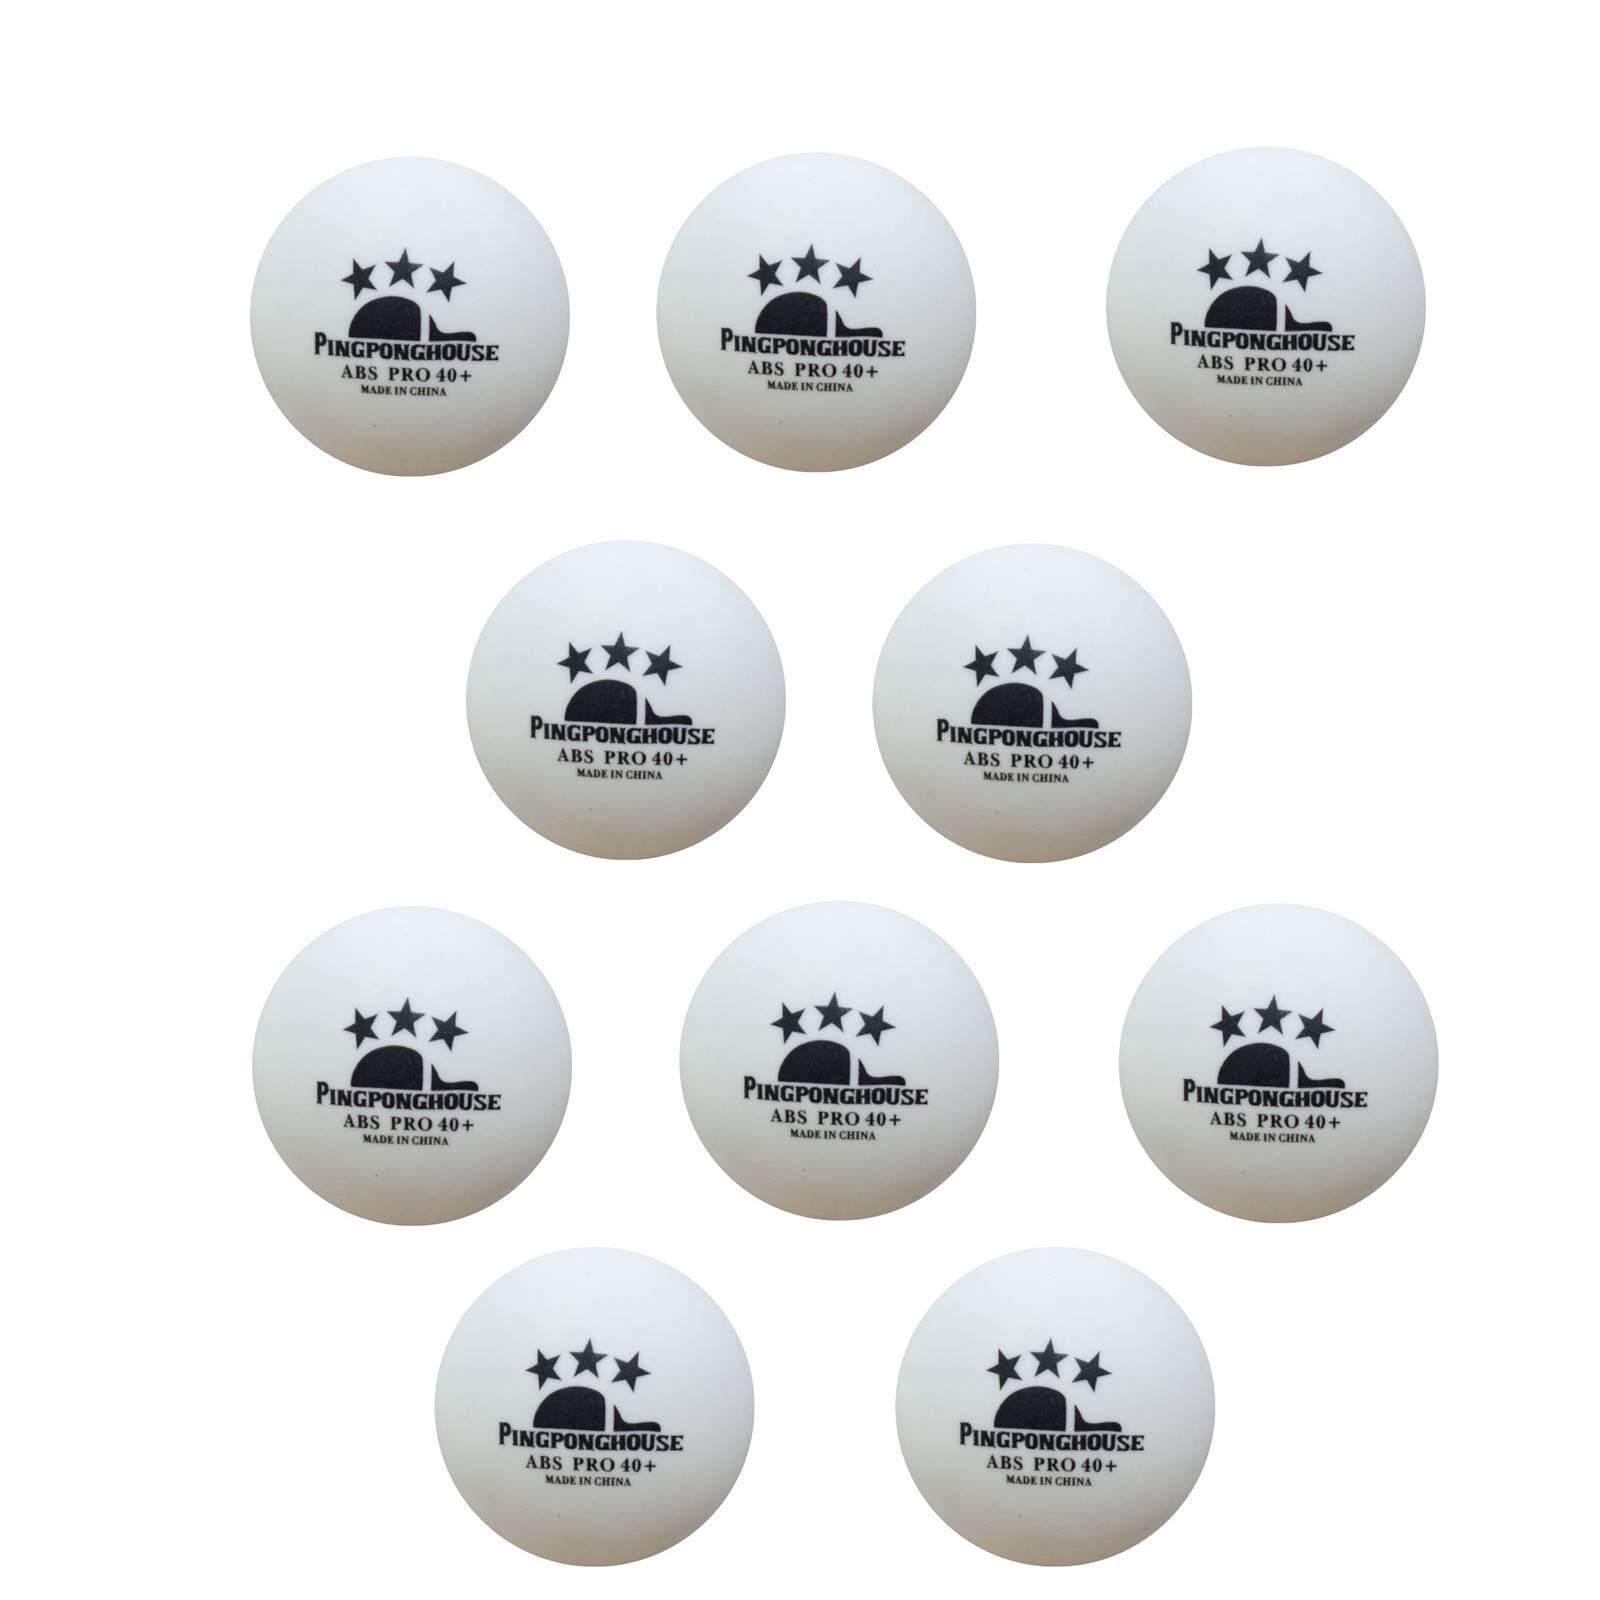 Pingponghouse ลูกปิงปอง 3 ดาว รุ่น Abs Pro 40+ สีขาว (จำนวน 10 ลูก) By Pingpong House.